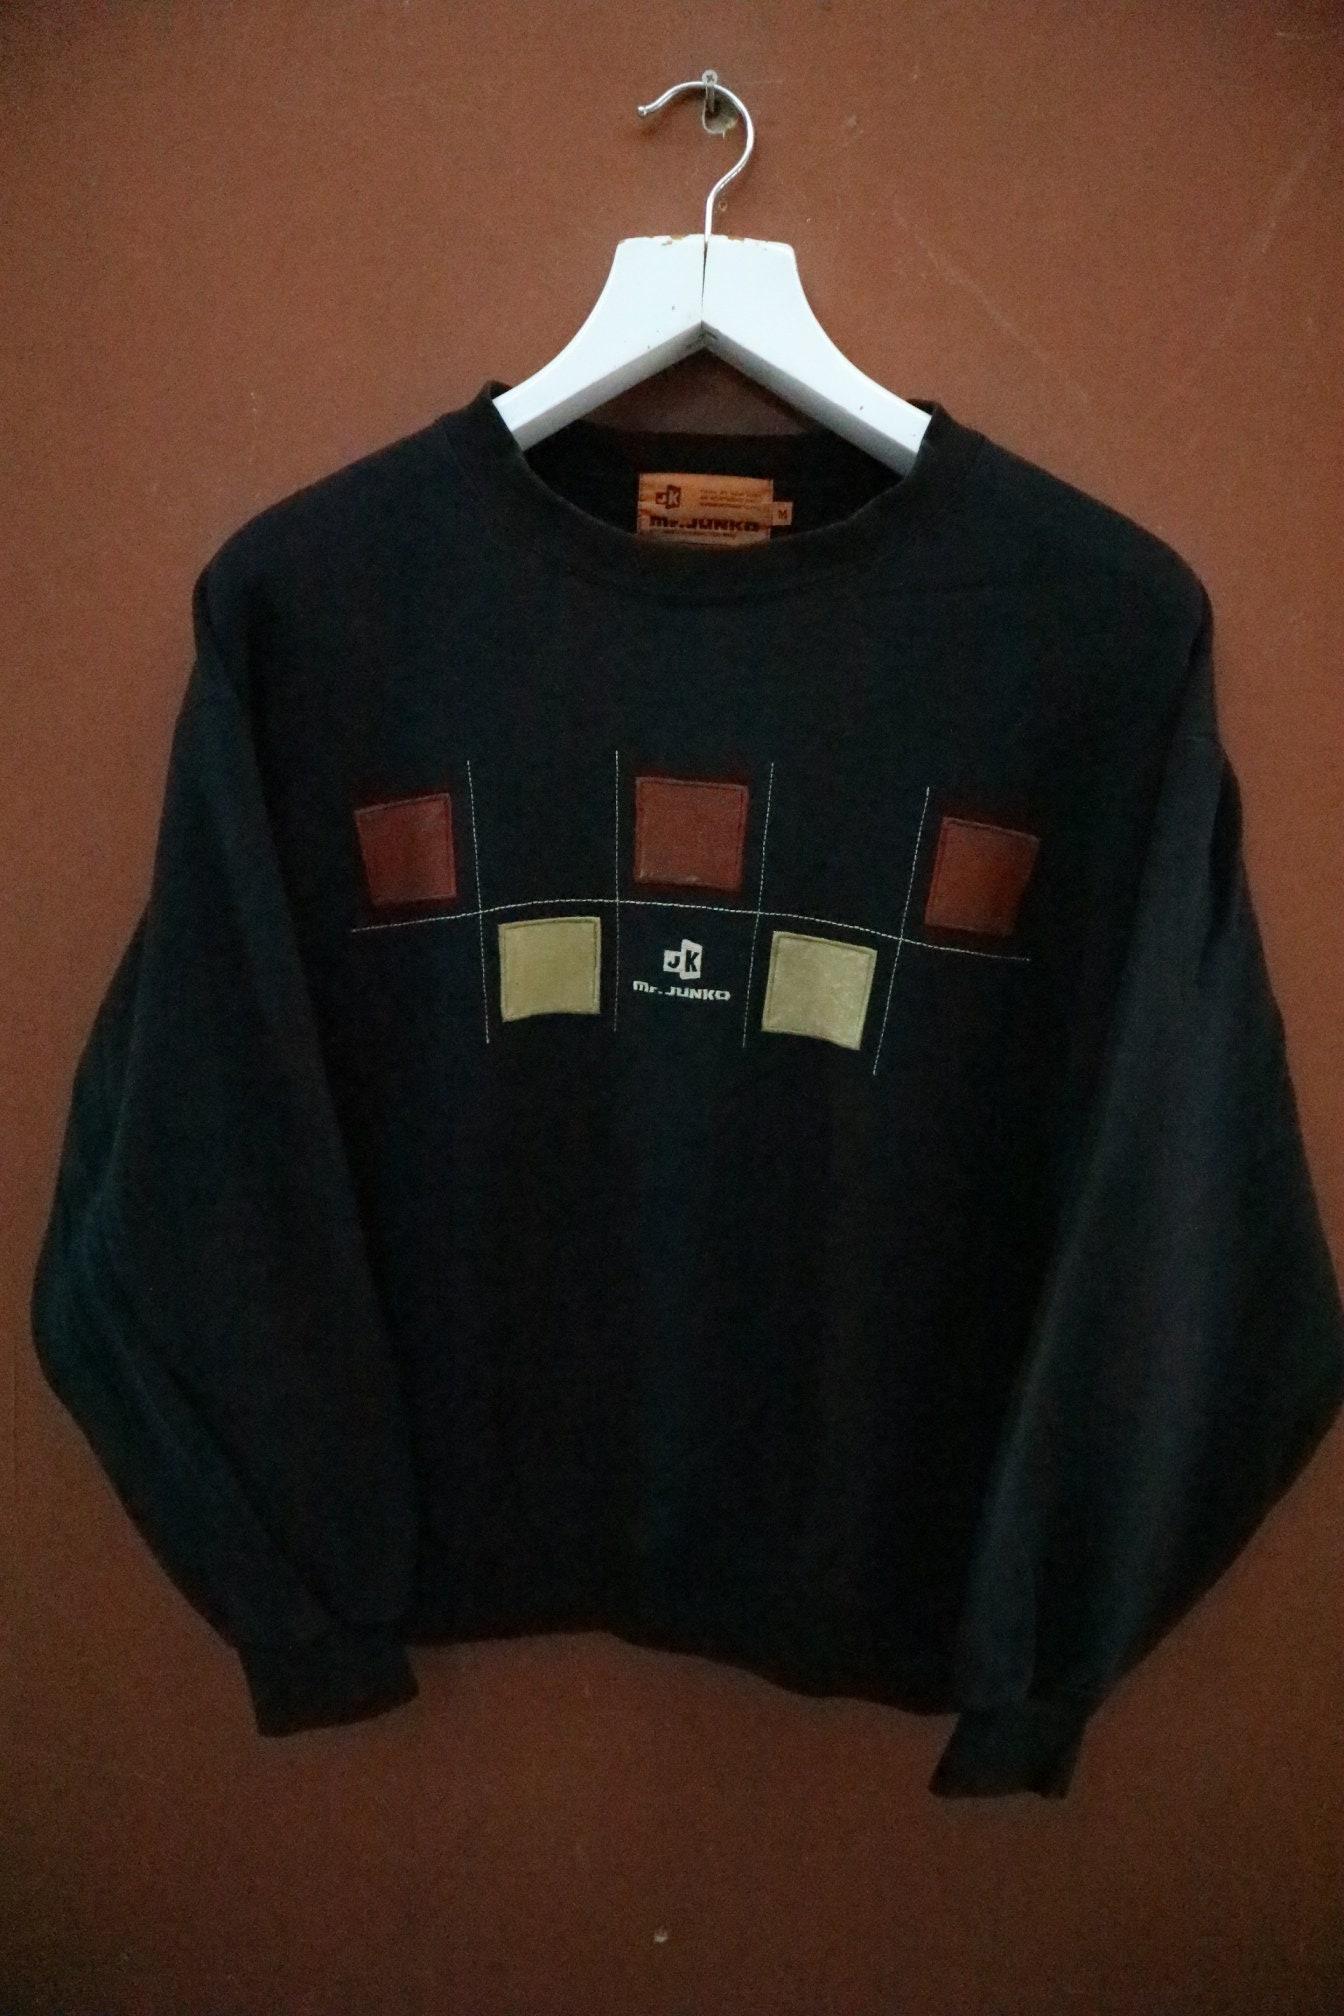 mr clothing Apparel  Sweaters  Fashion Sweatshirts  Fashion Sweatshirts